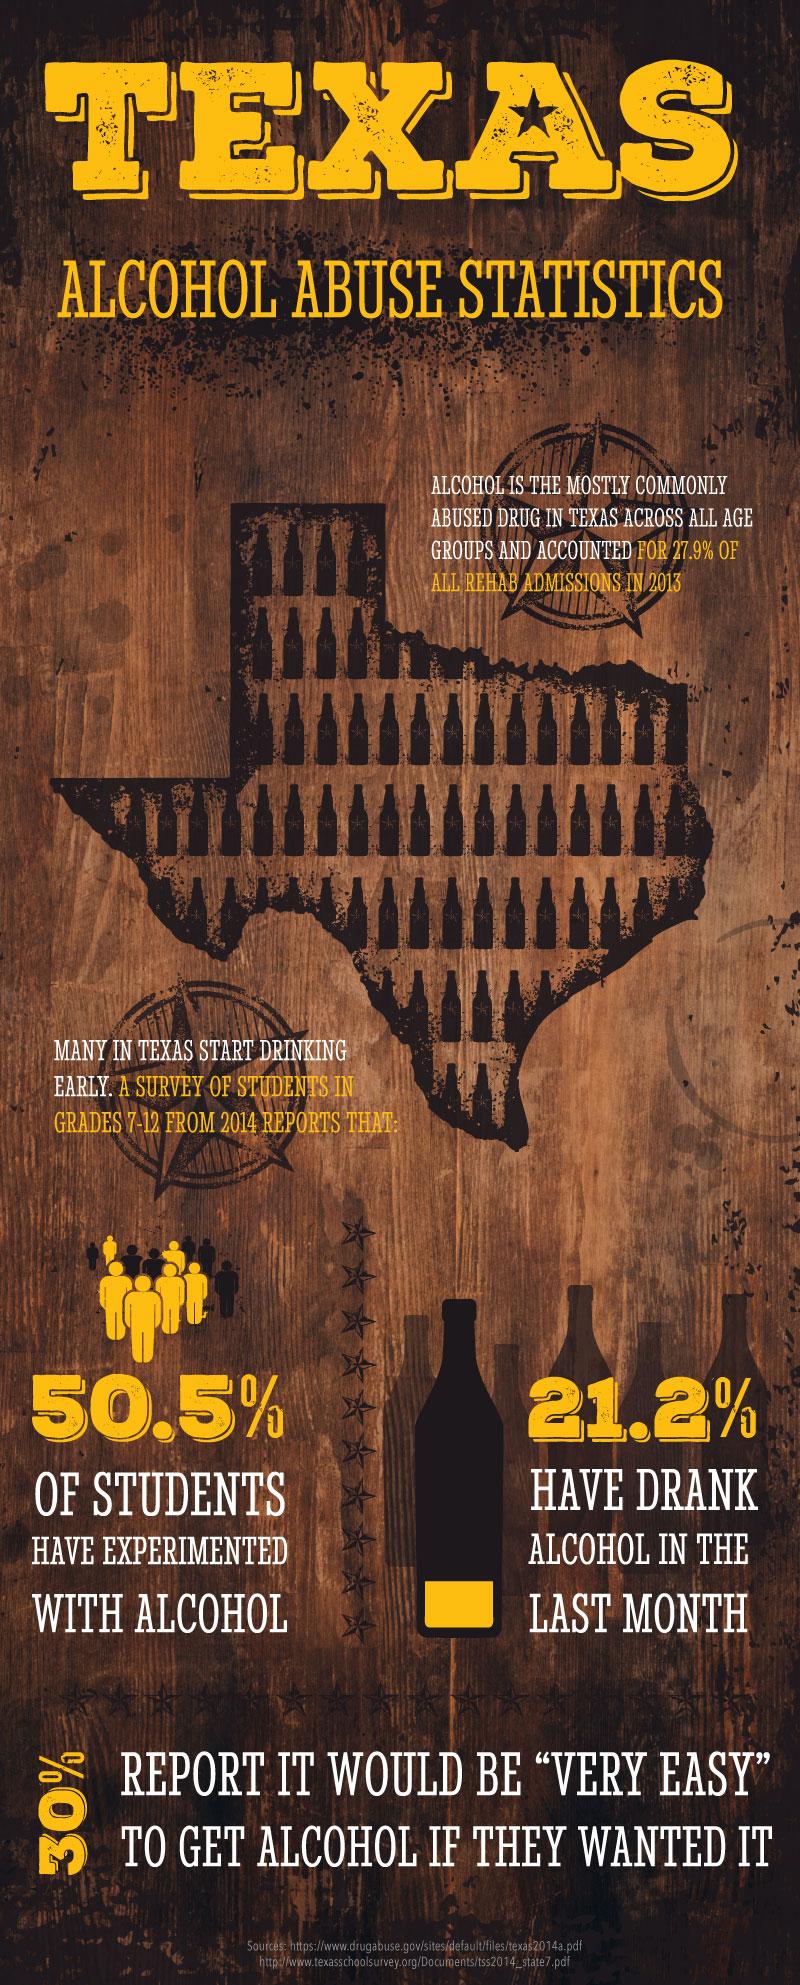 Texas Alcohol Abuse Statistics Infographic